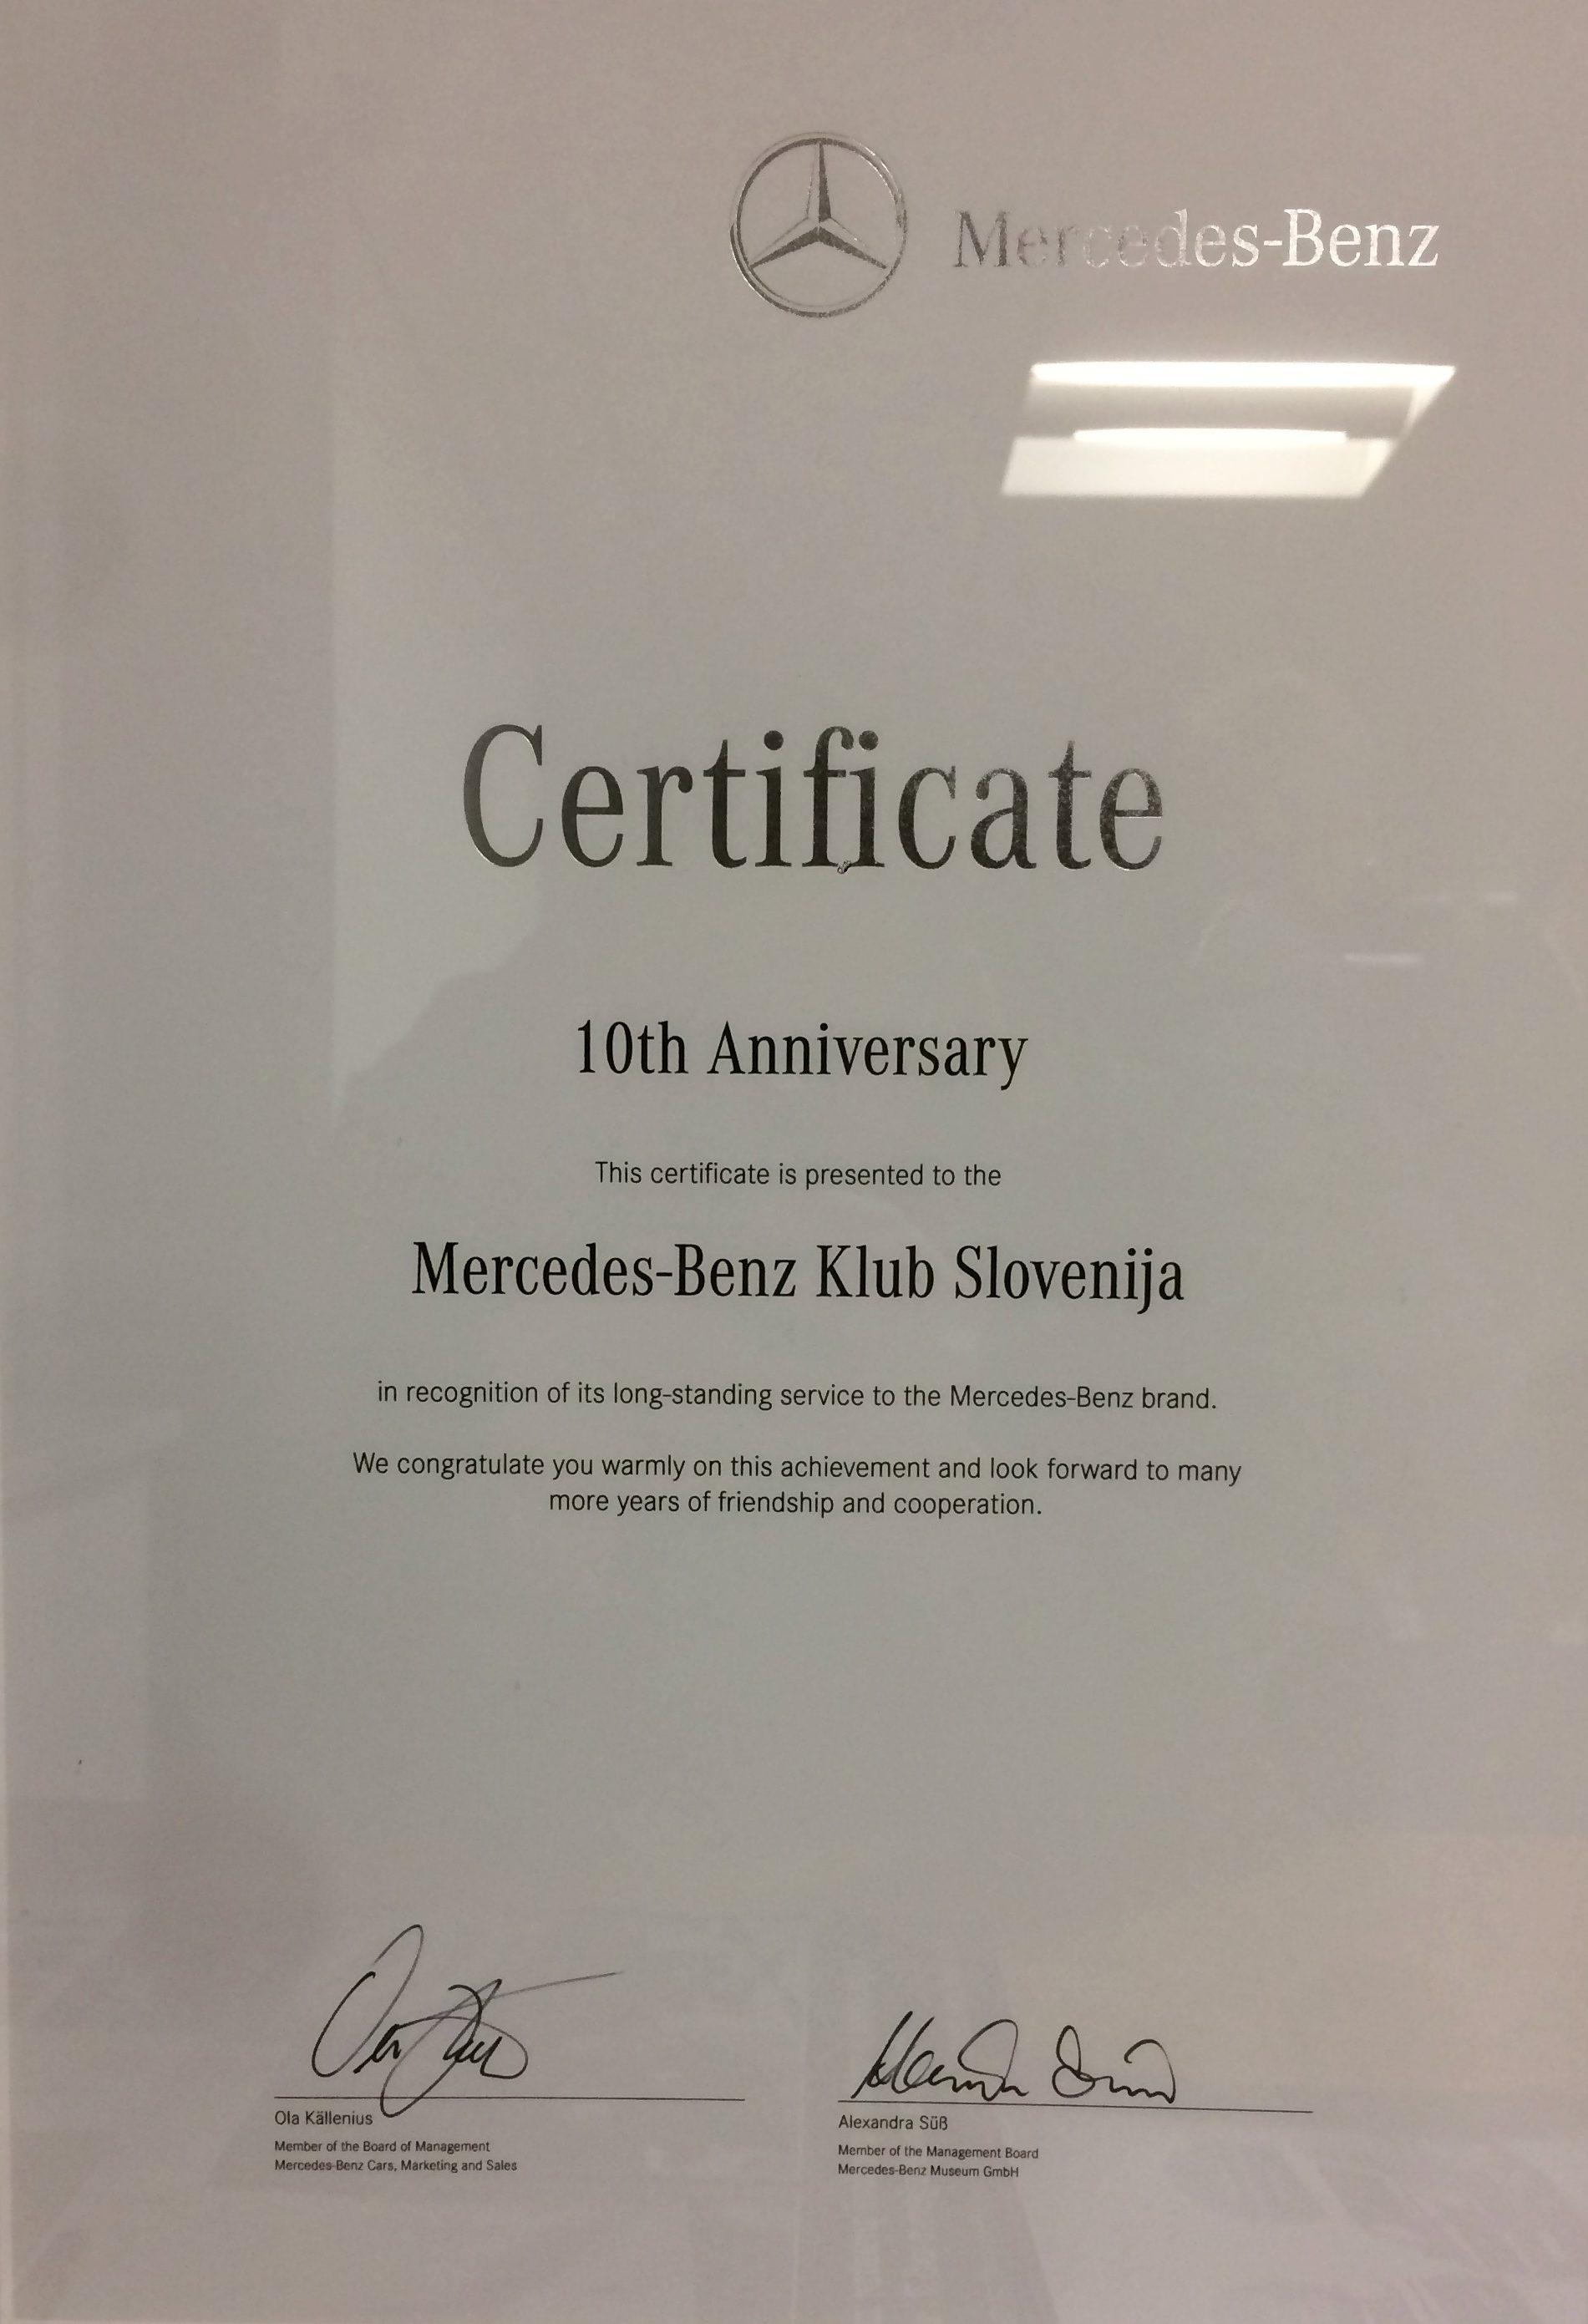 Priznanje Mercedes-Benz Clubs Managementa (MBCM).